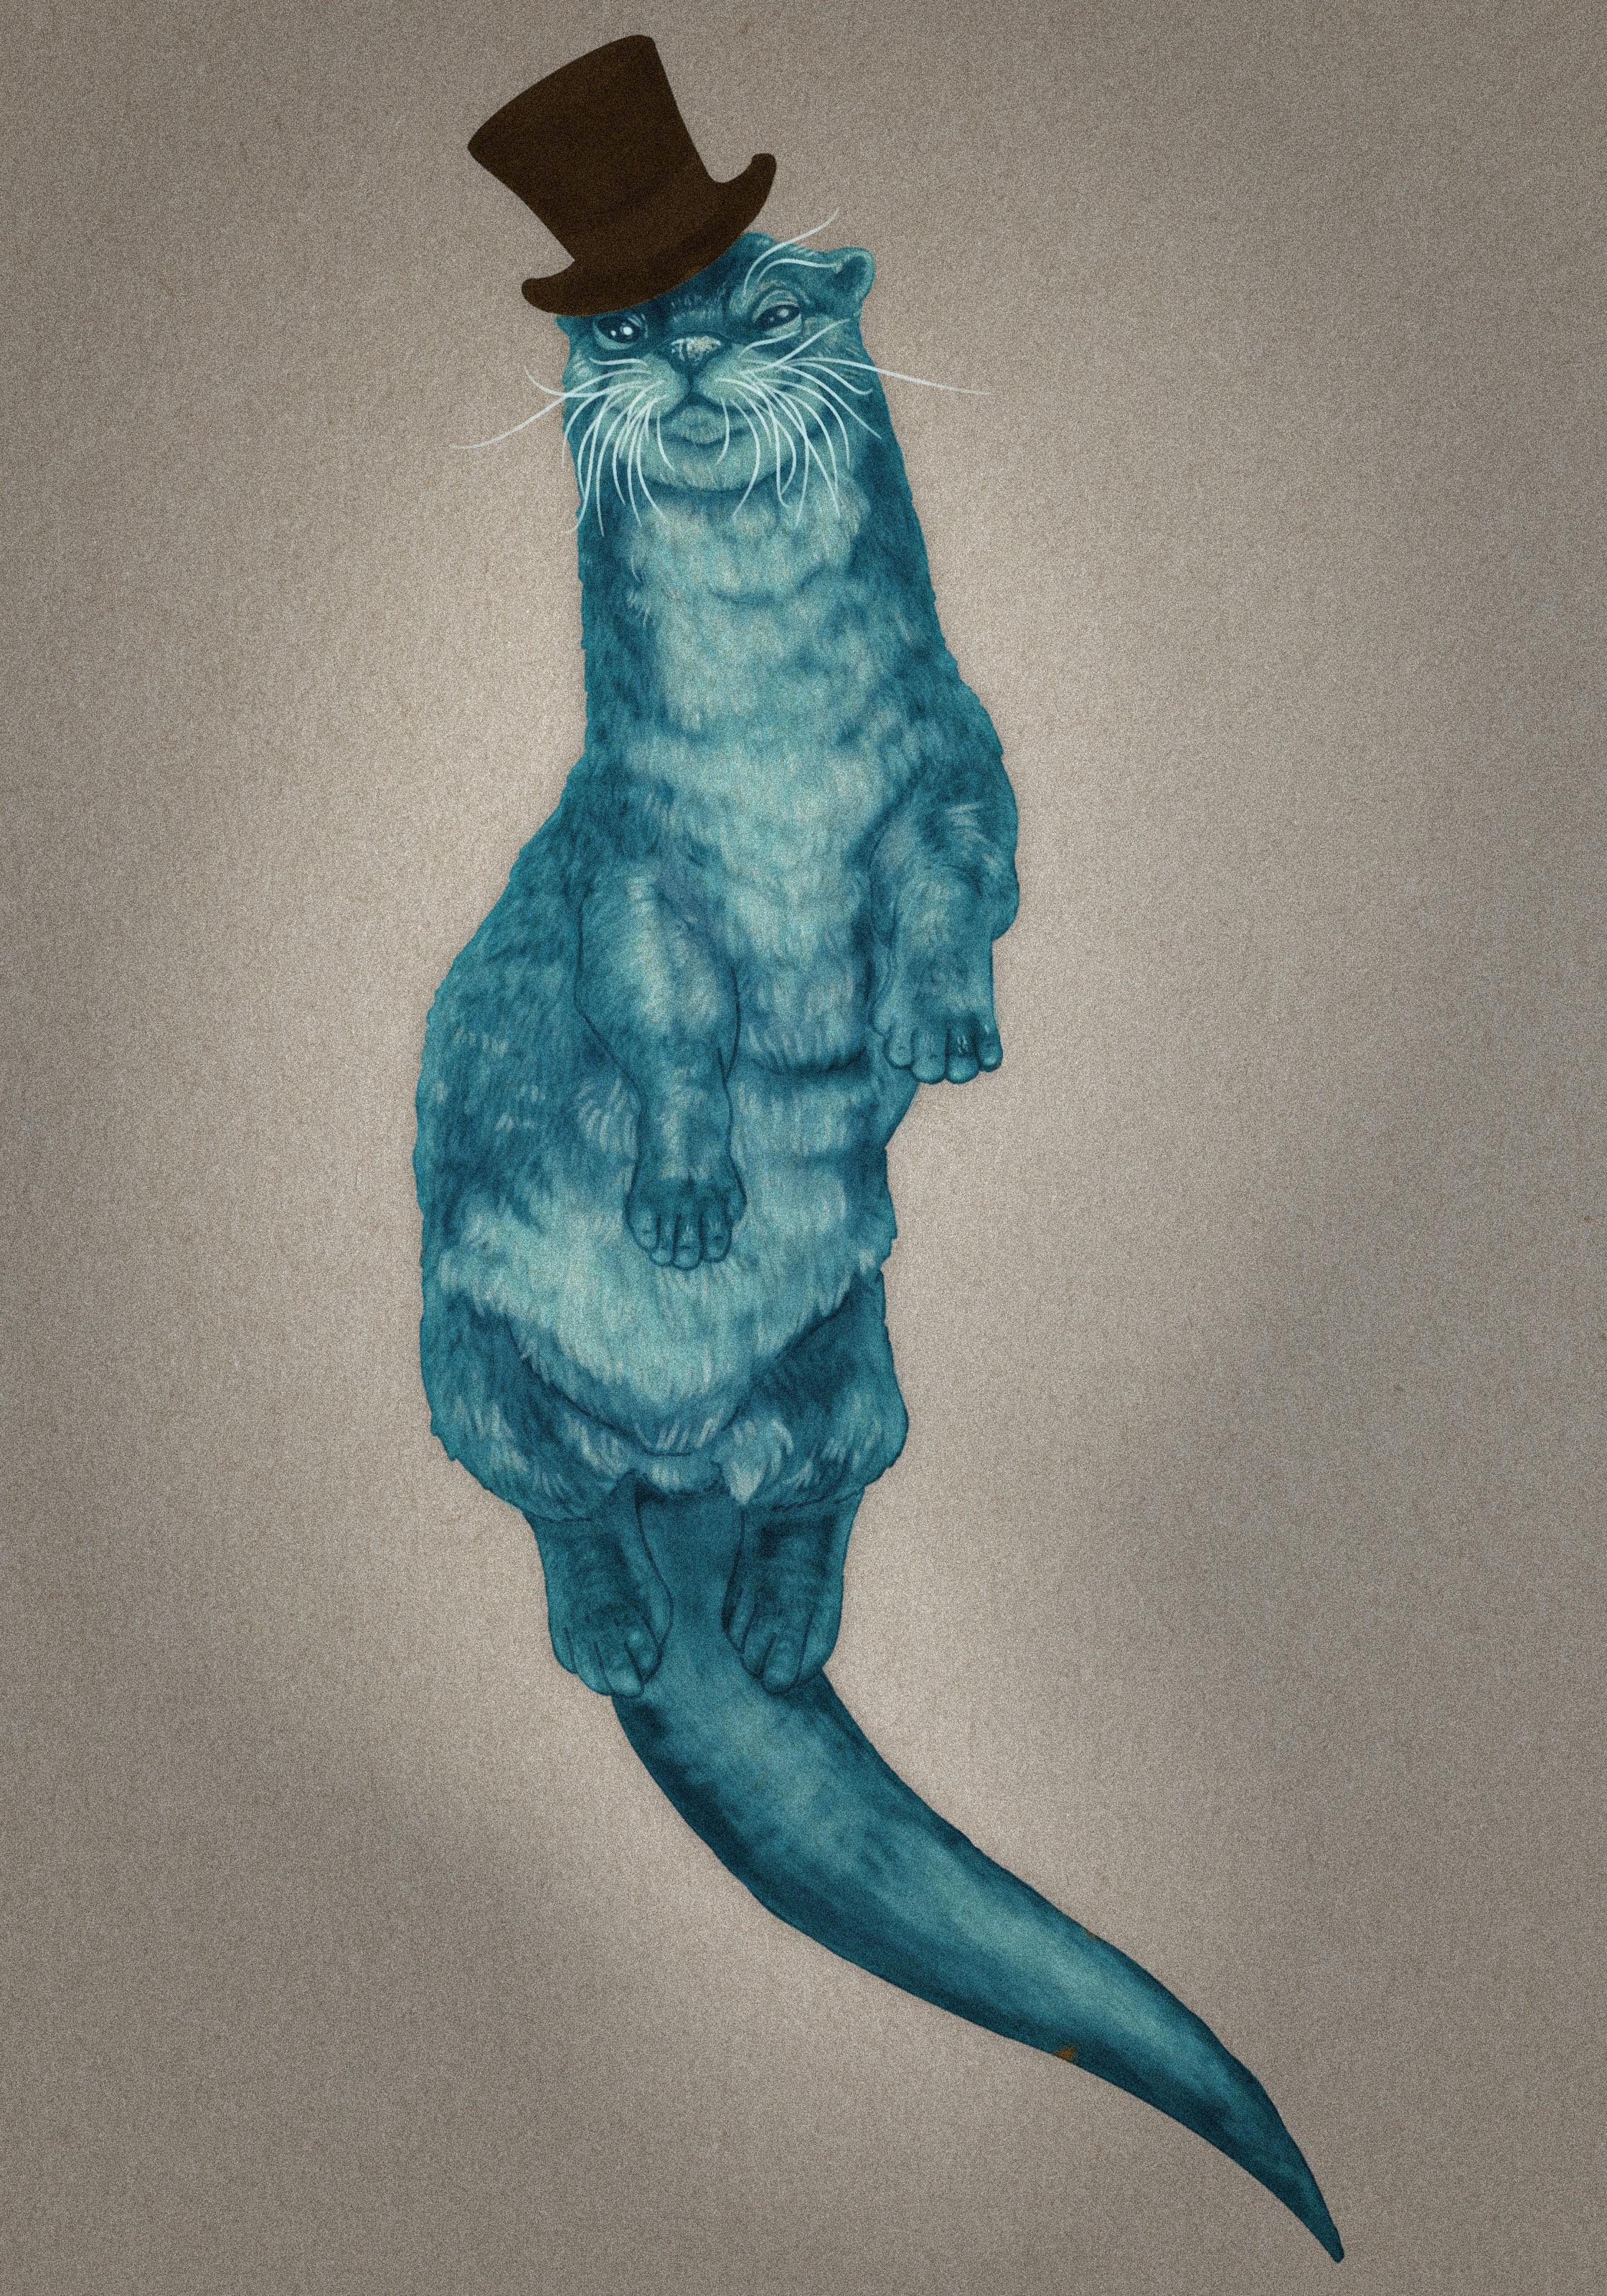 Juabe the Spirit Otter - by Cloe